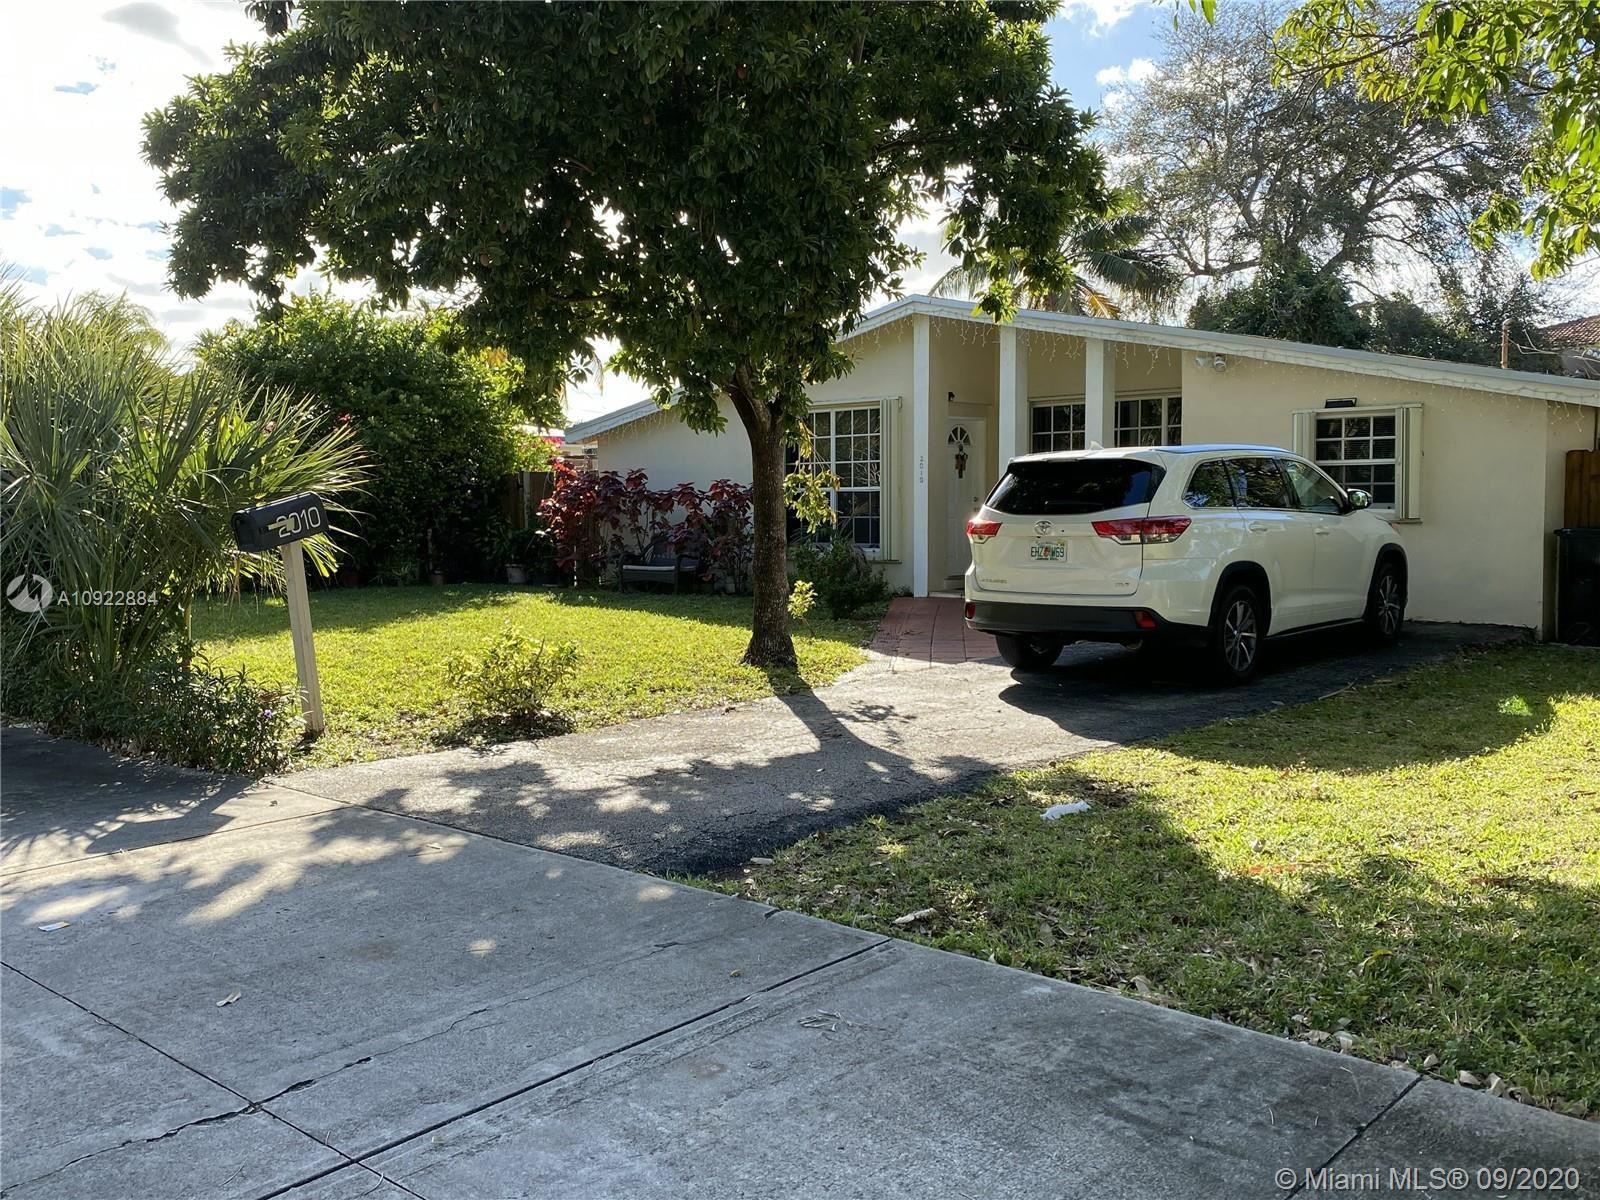 2010 NE 171st St, North Miami Beach, FL 33162 - #: A10922884